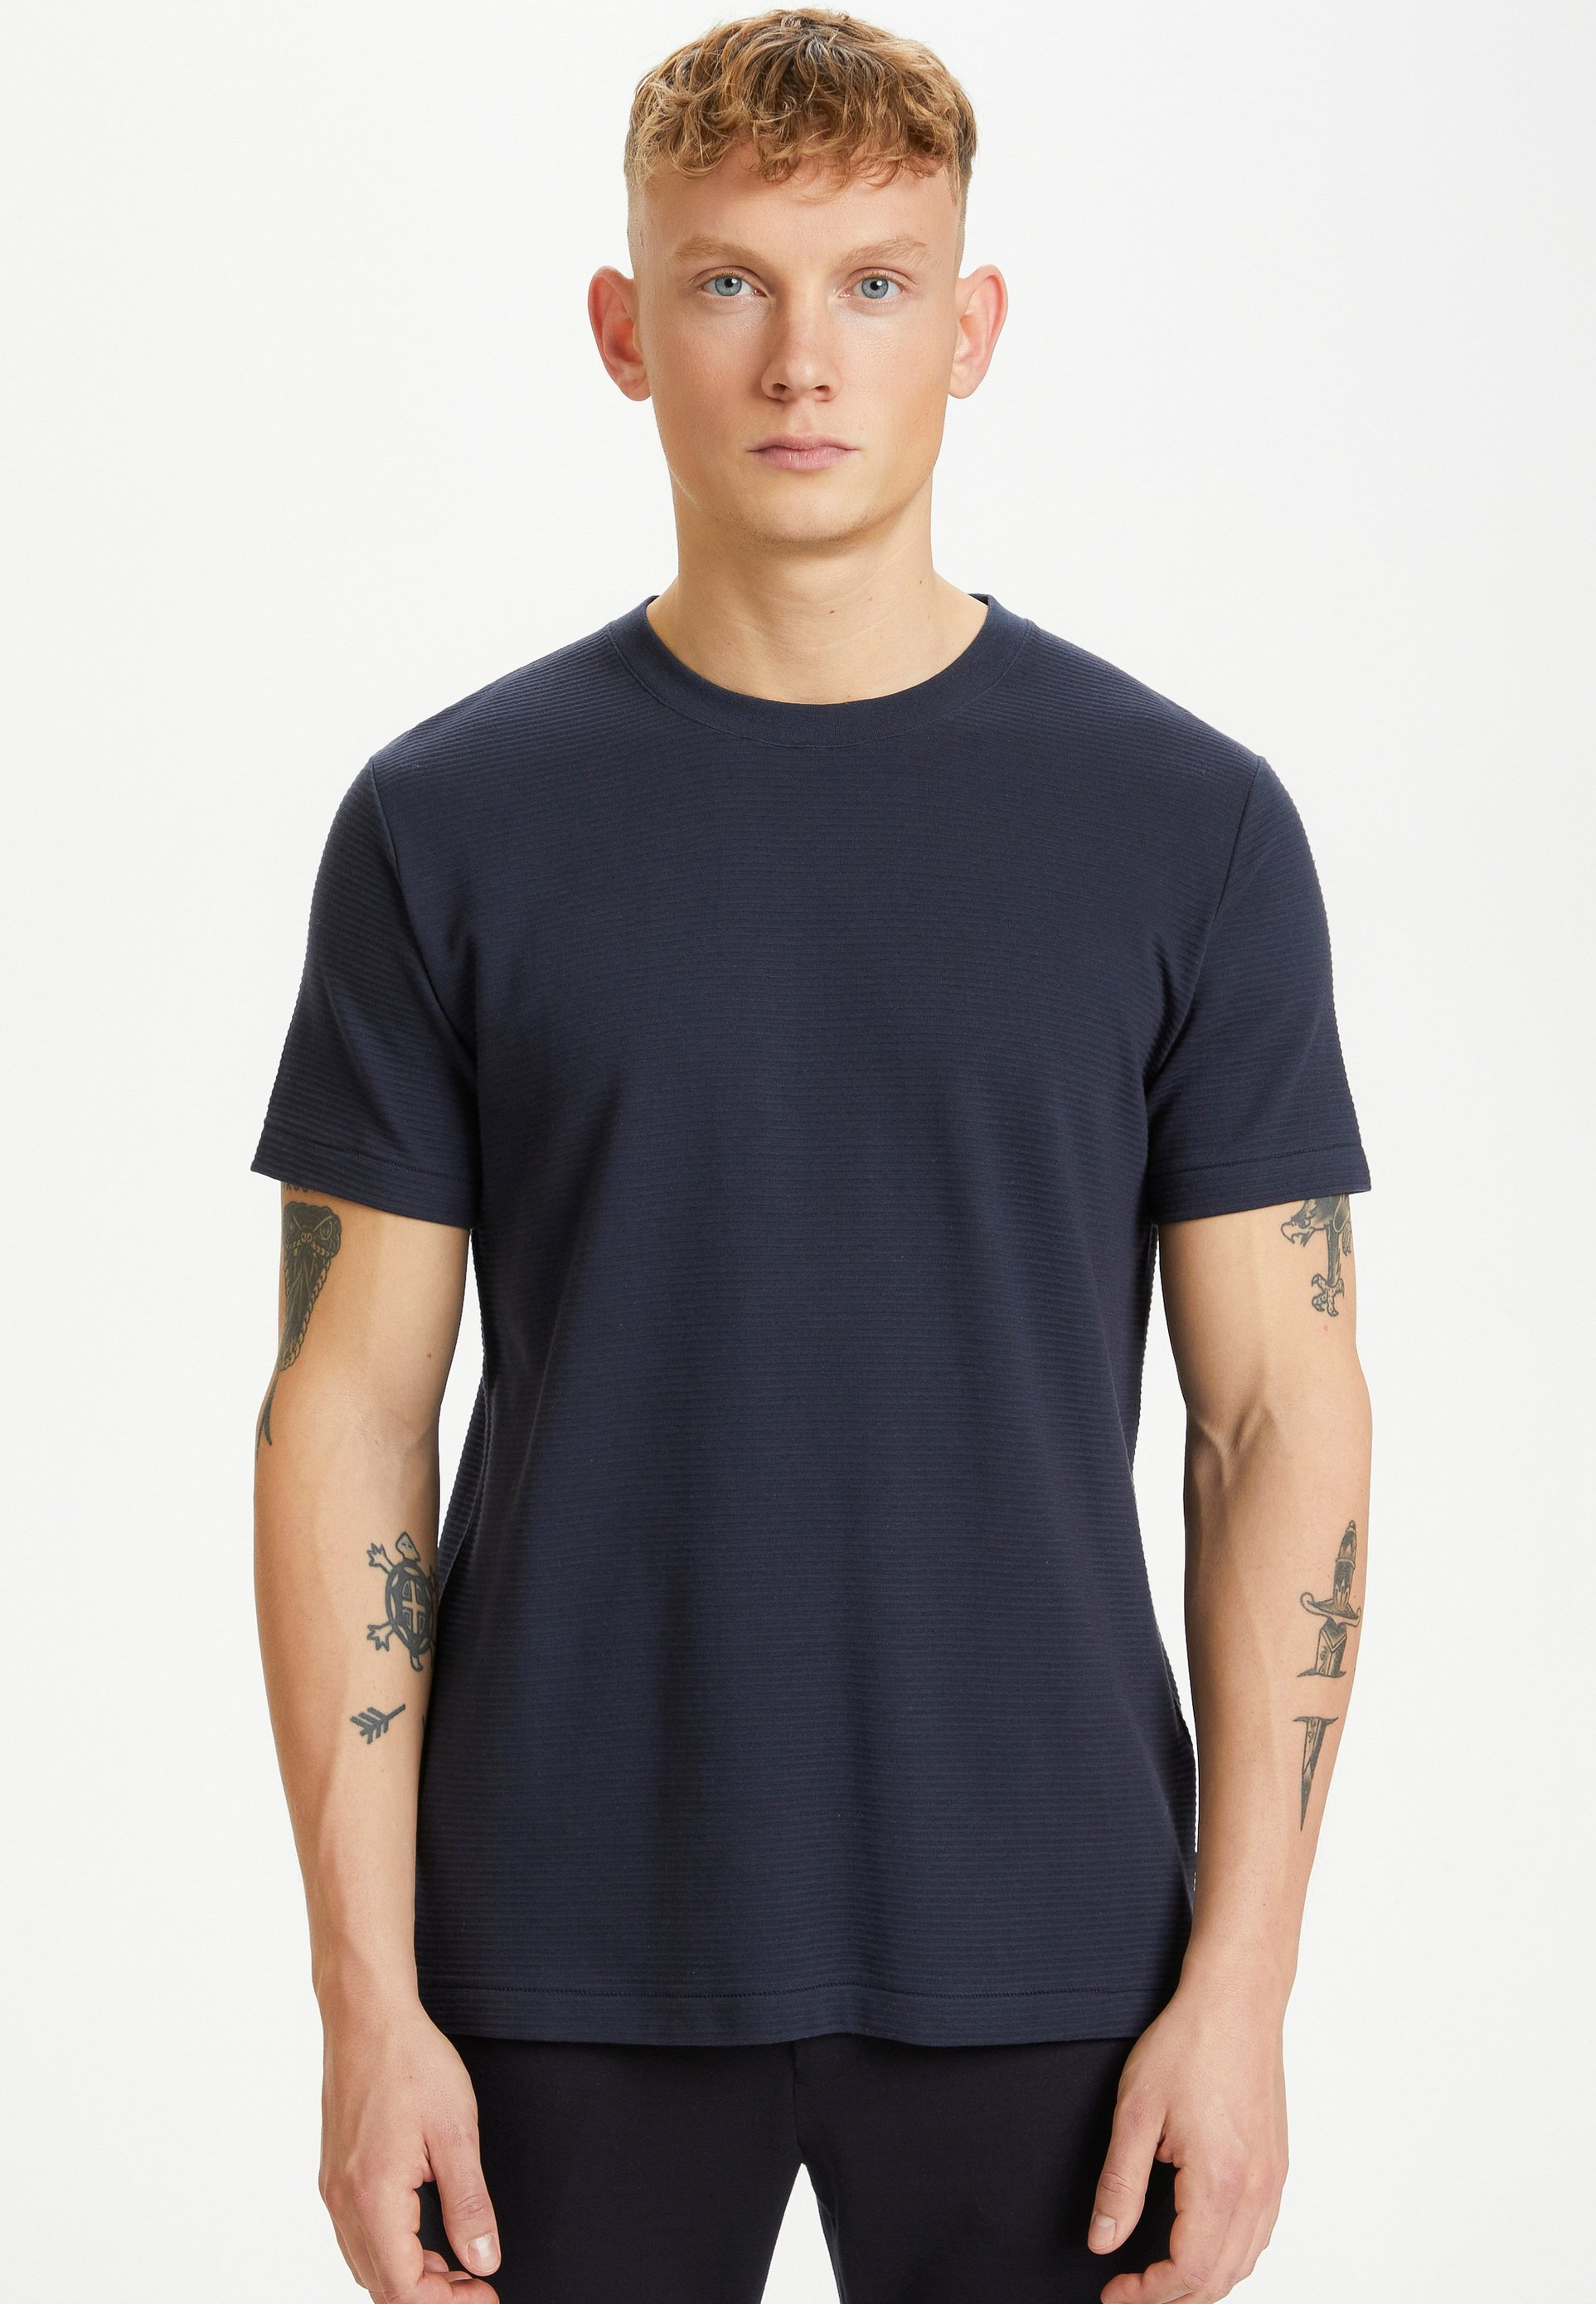 Homme MAJERMANE RIPPLE STRIPE - T-shirt basique